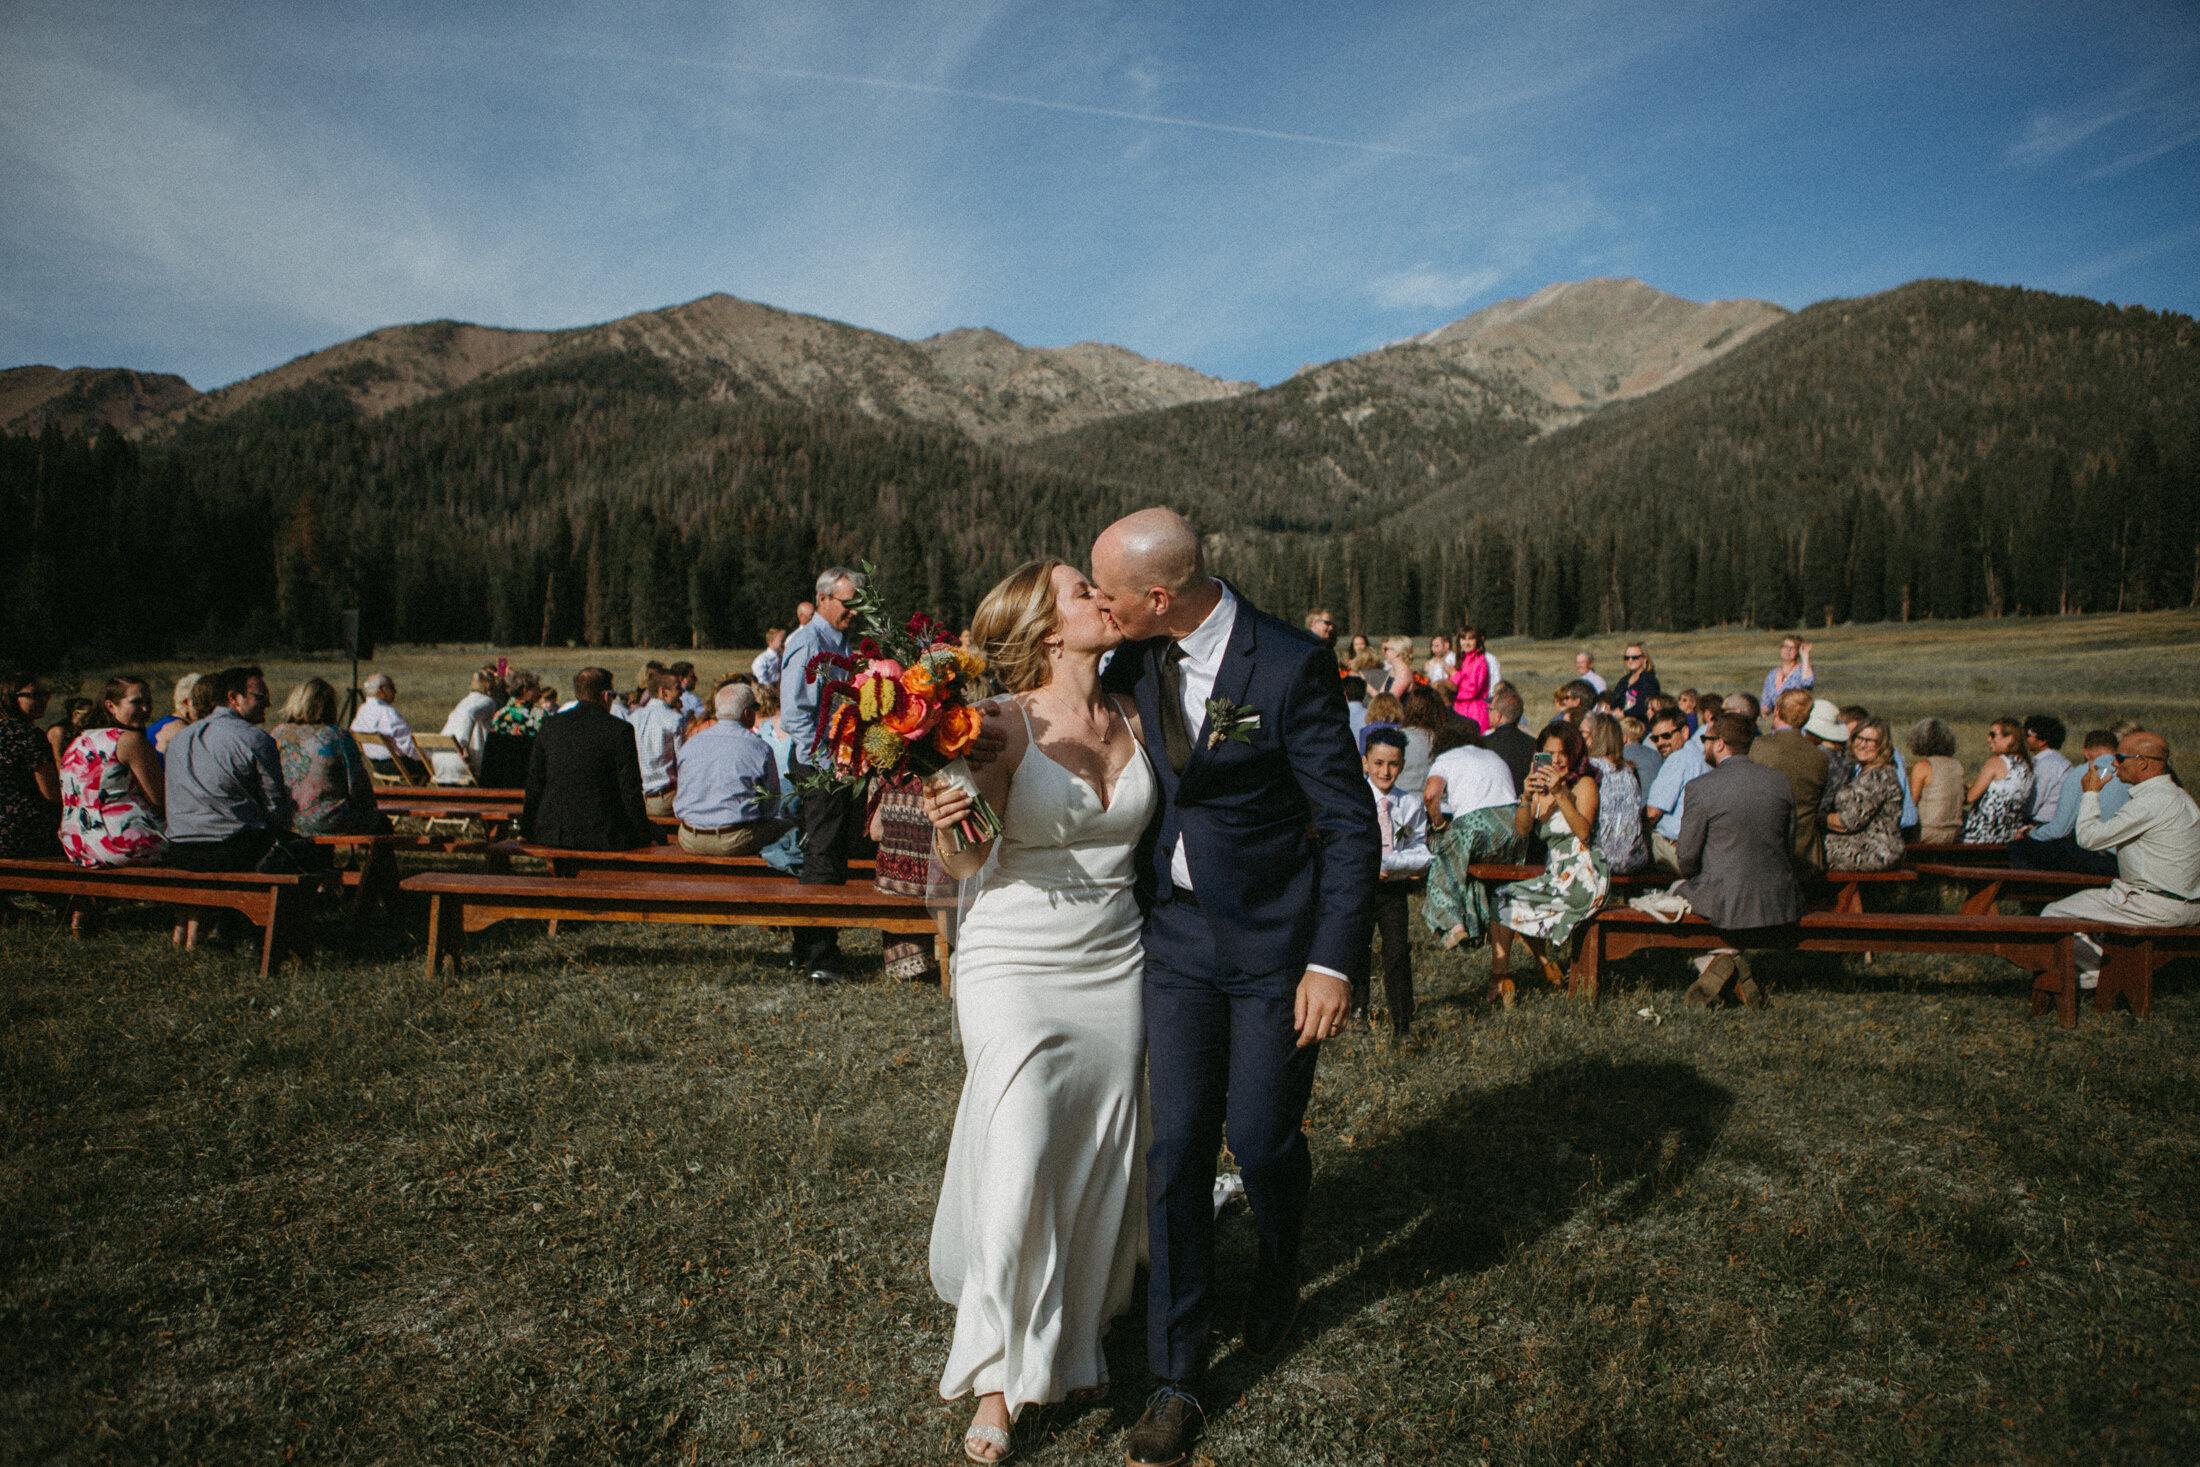 galena-lodge-wedding-christine-marie-photo-a-r-64.jpg